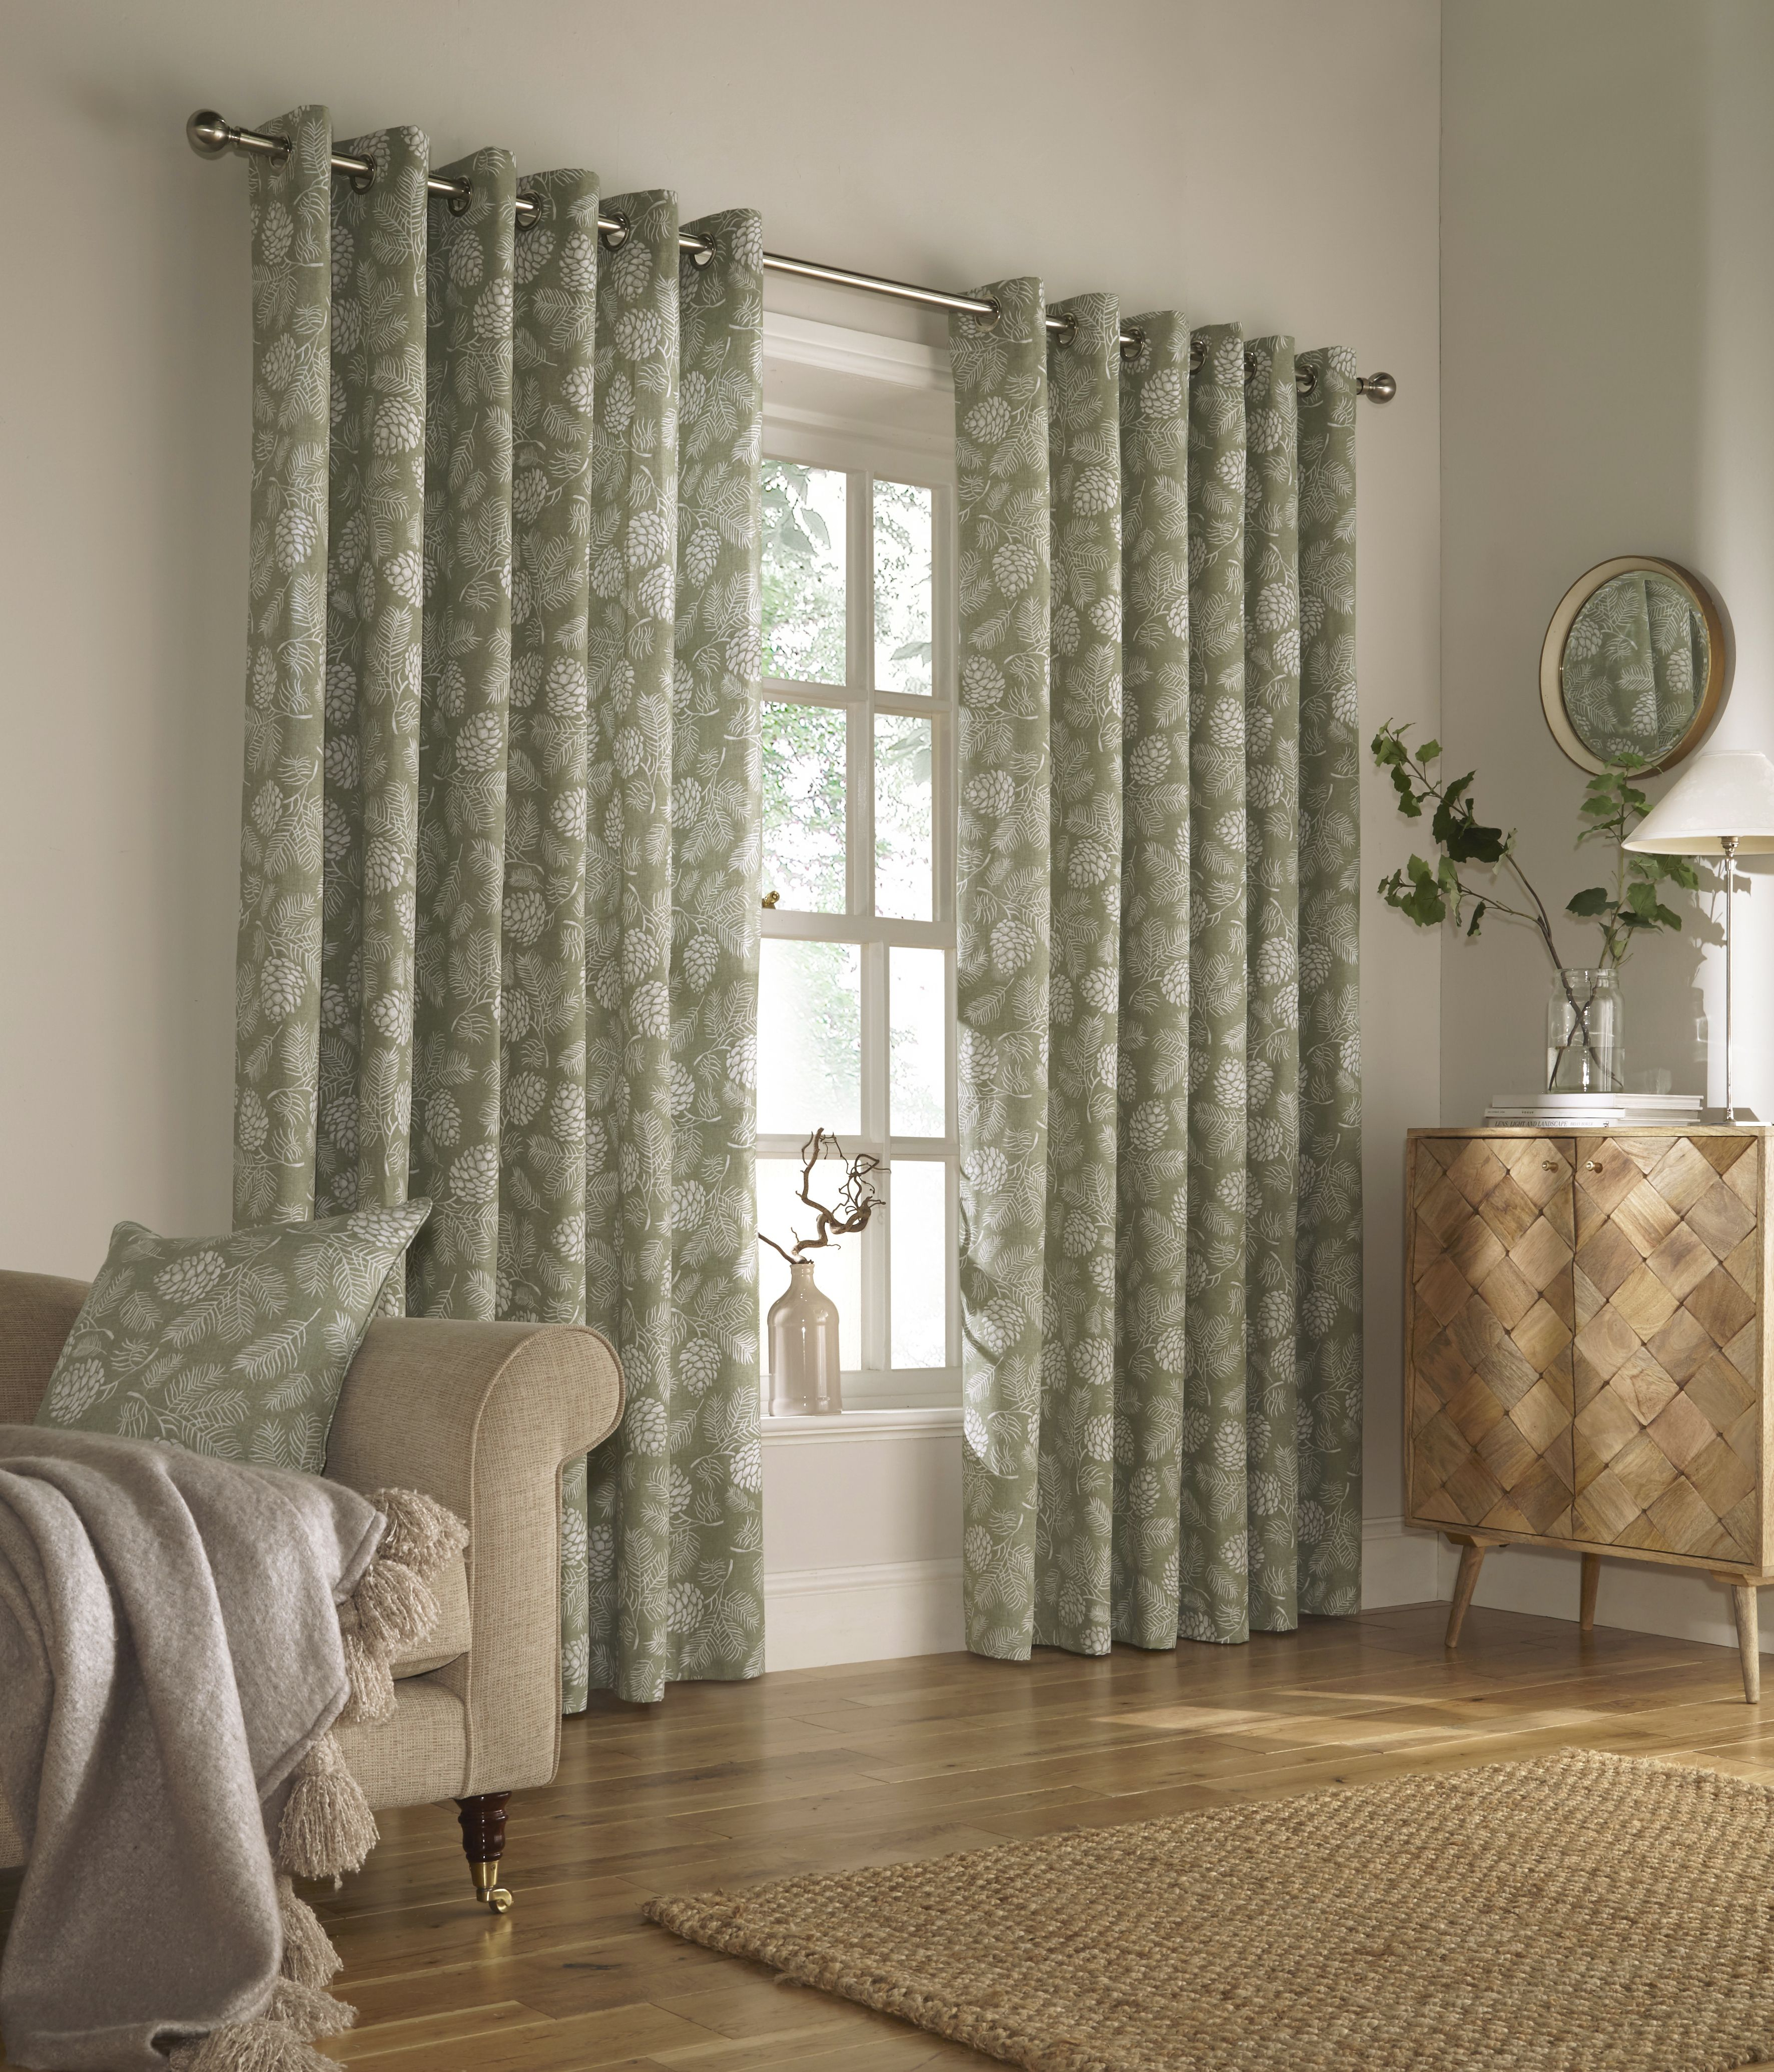 Irwin Printed Woodland Eyelet Curtains in Sage